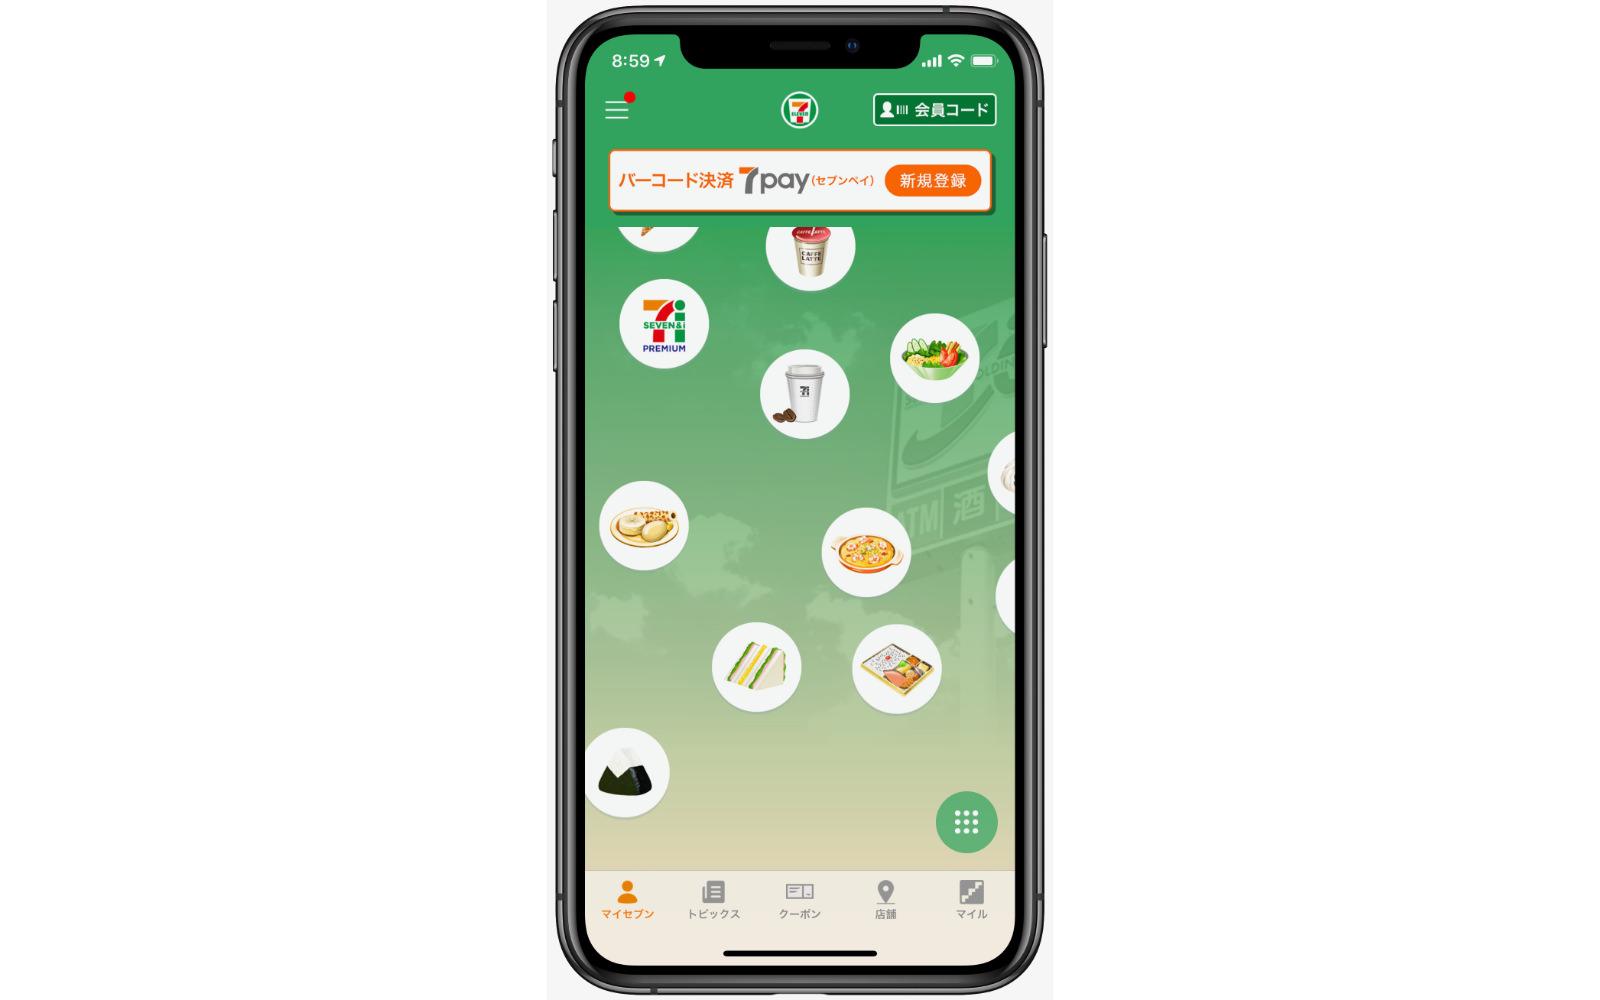 Seven Pay App